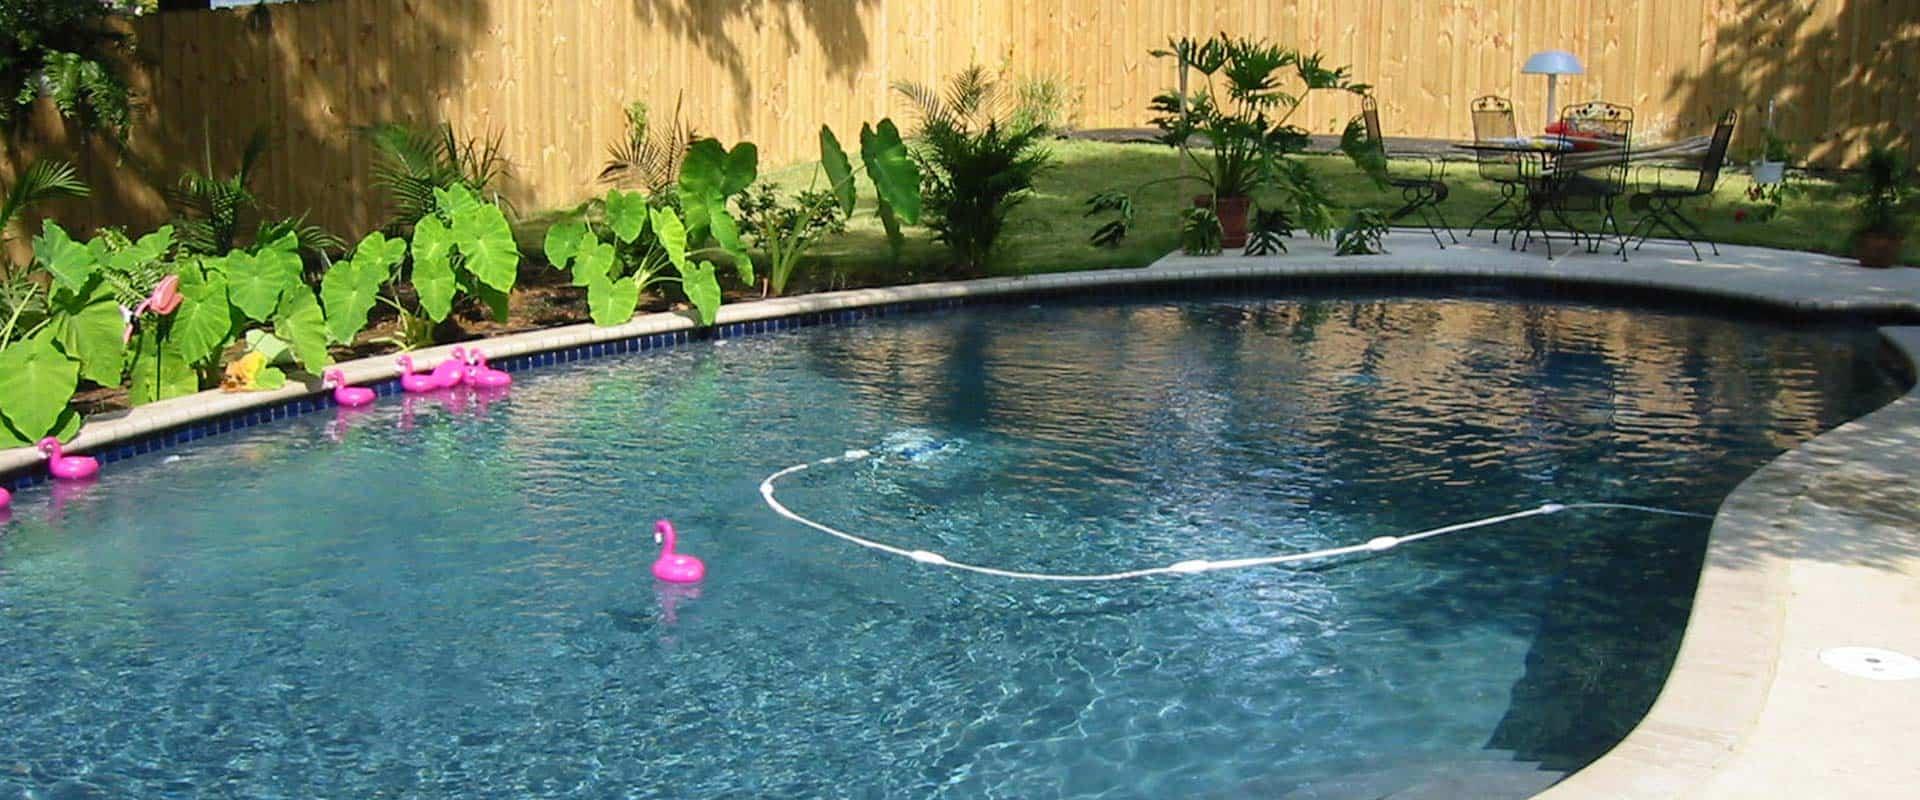 Pool Builders Memphis Tn Bindu Bhatia Astrology